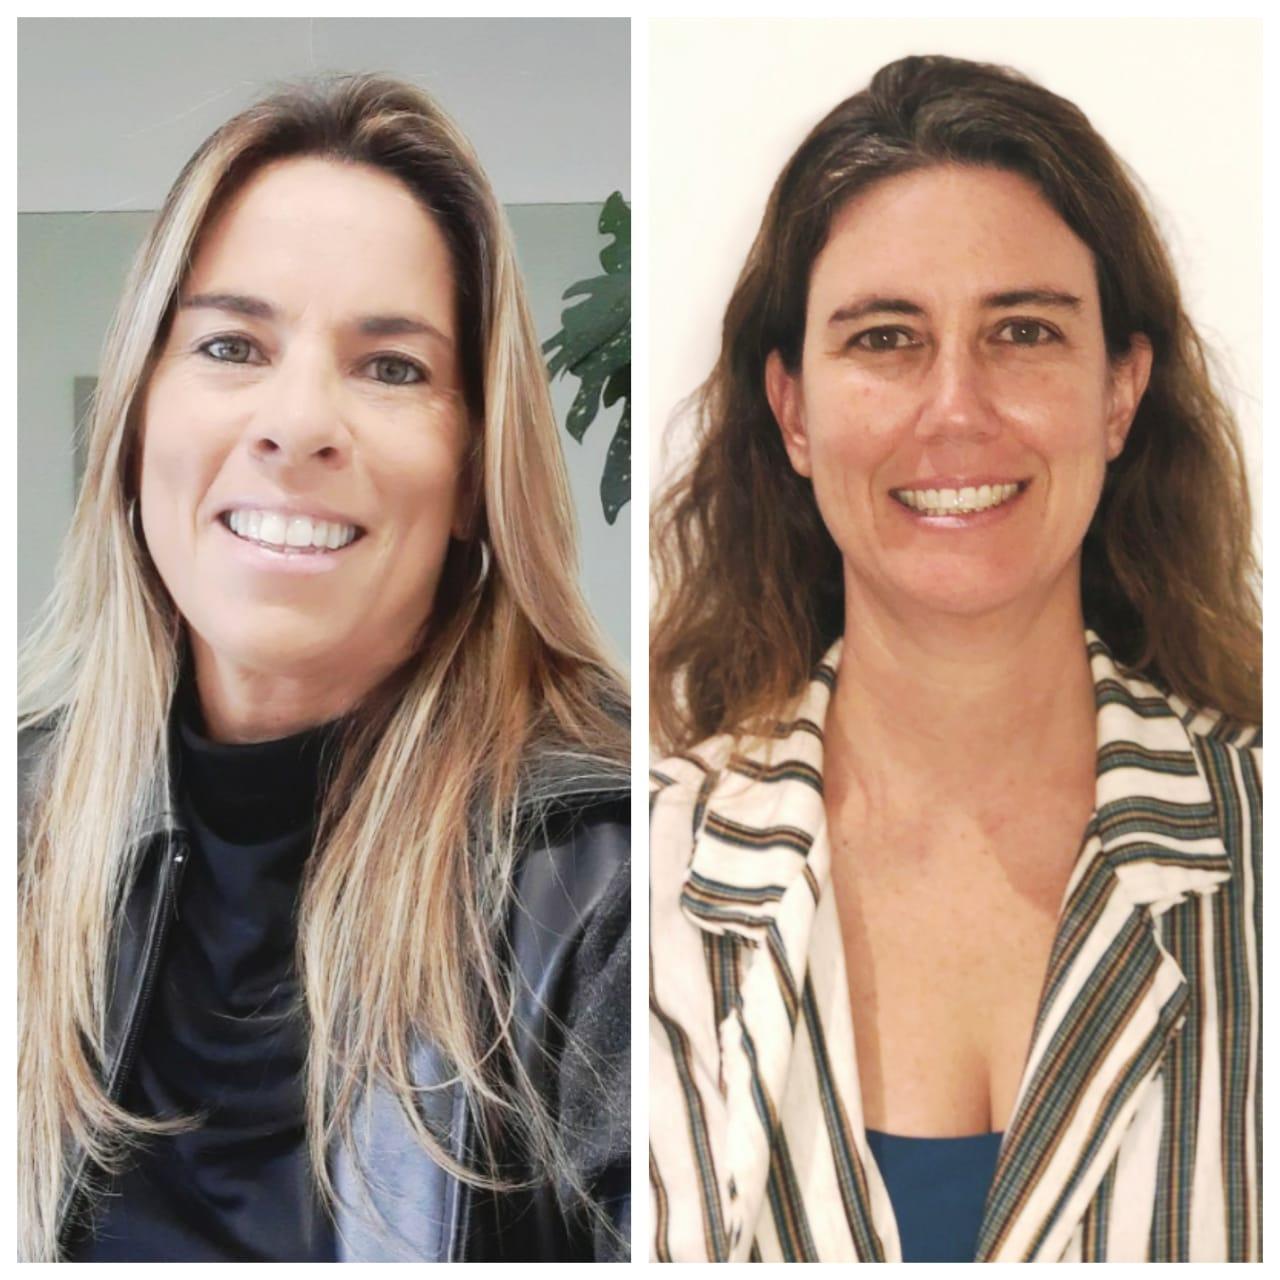 Colunista Sabina Augras e Laura Fuks